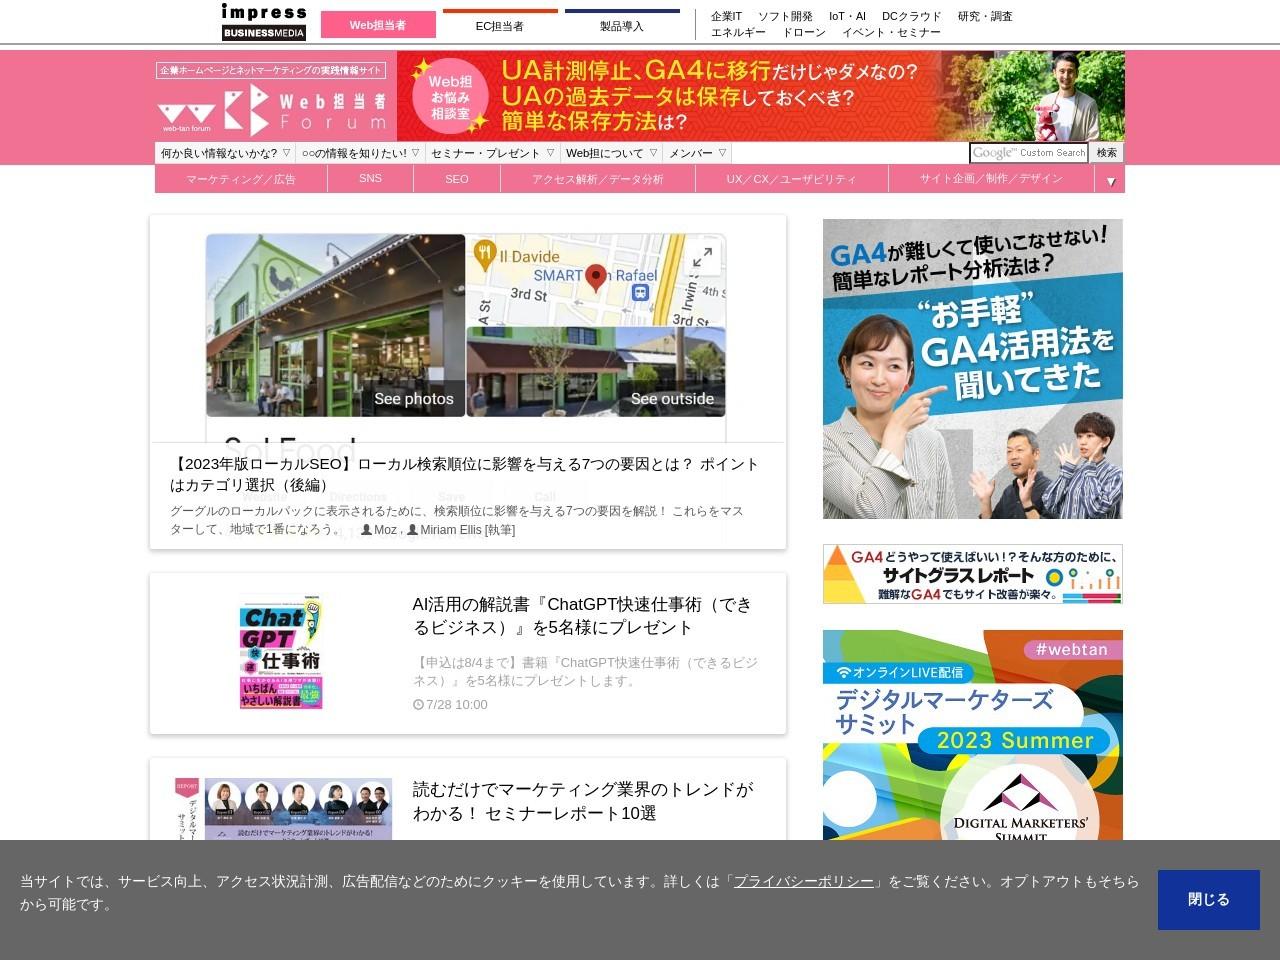 https://webtan.impress.co.jp/e/2019/04/16/32430